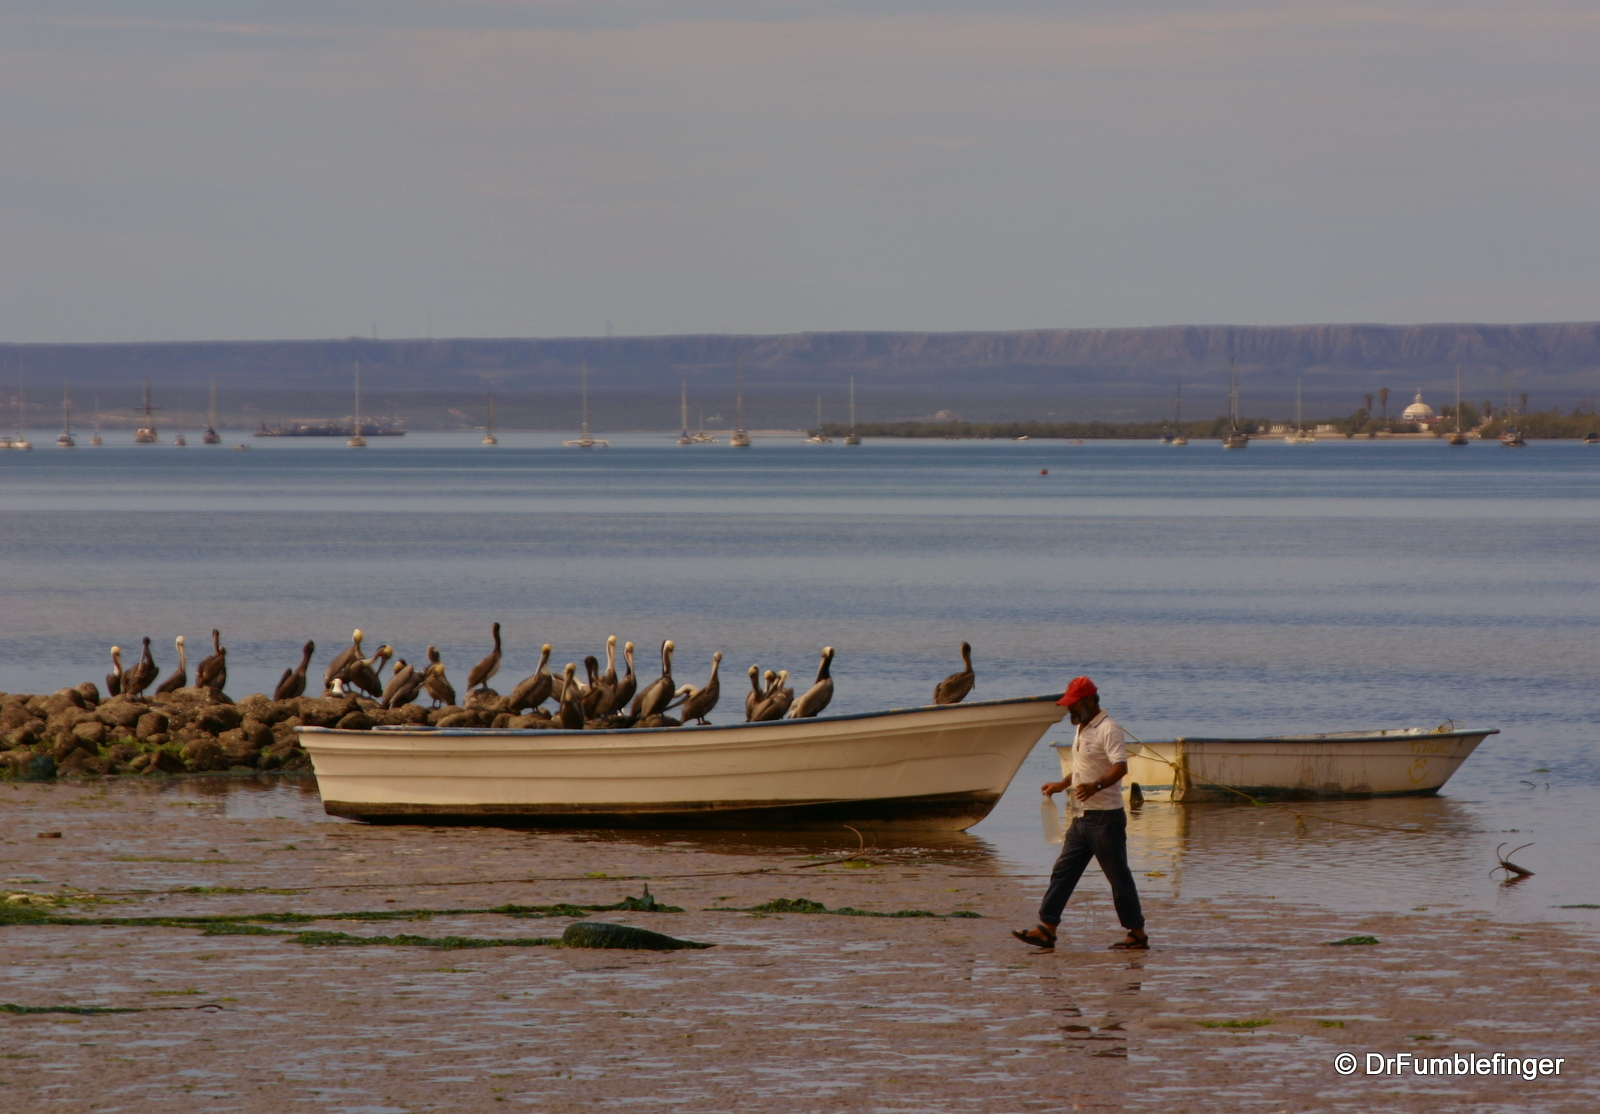 Fisherman & pelicans, La Paz' harbor